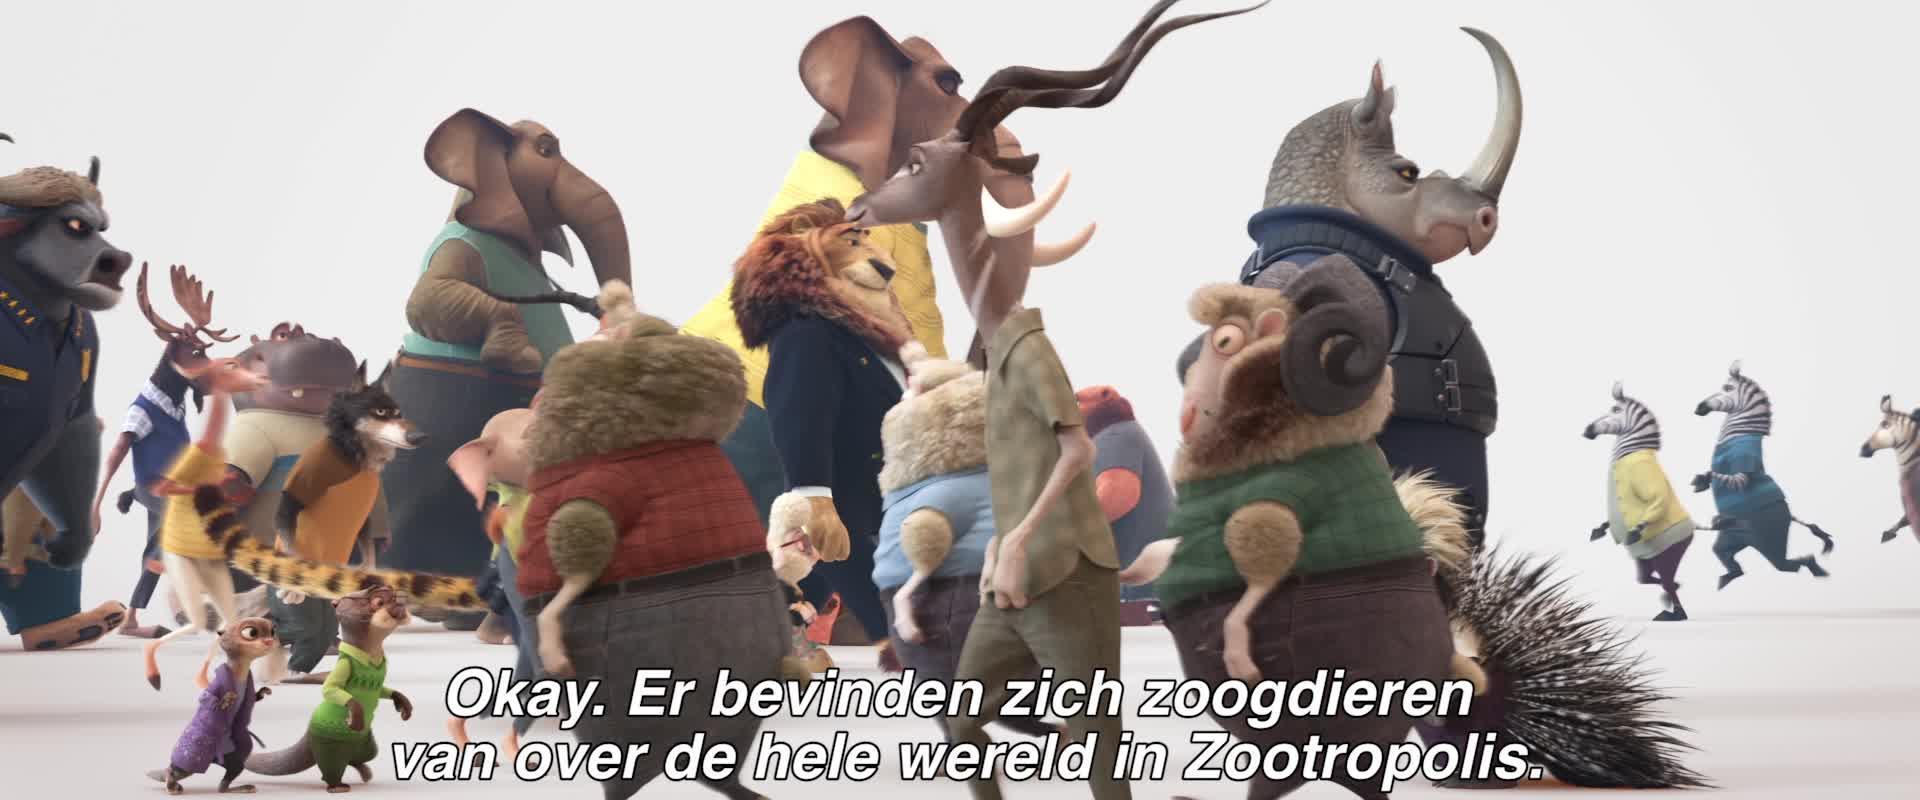 Zootropolis - Teaser Trailer